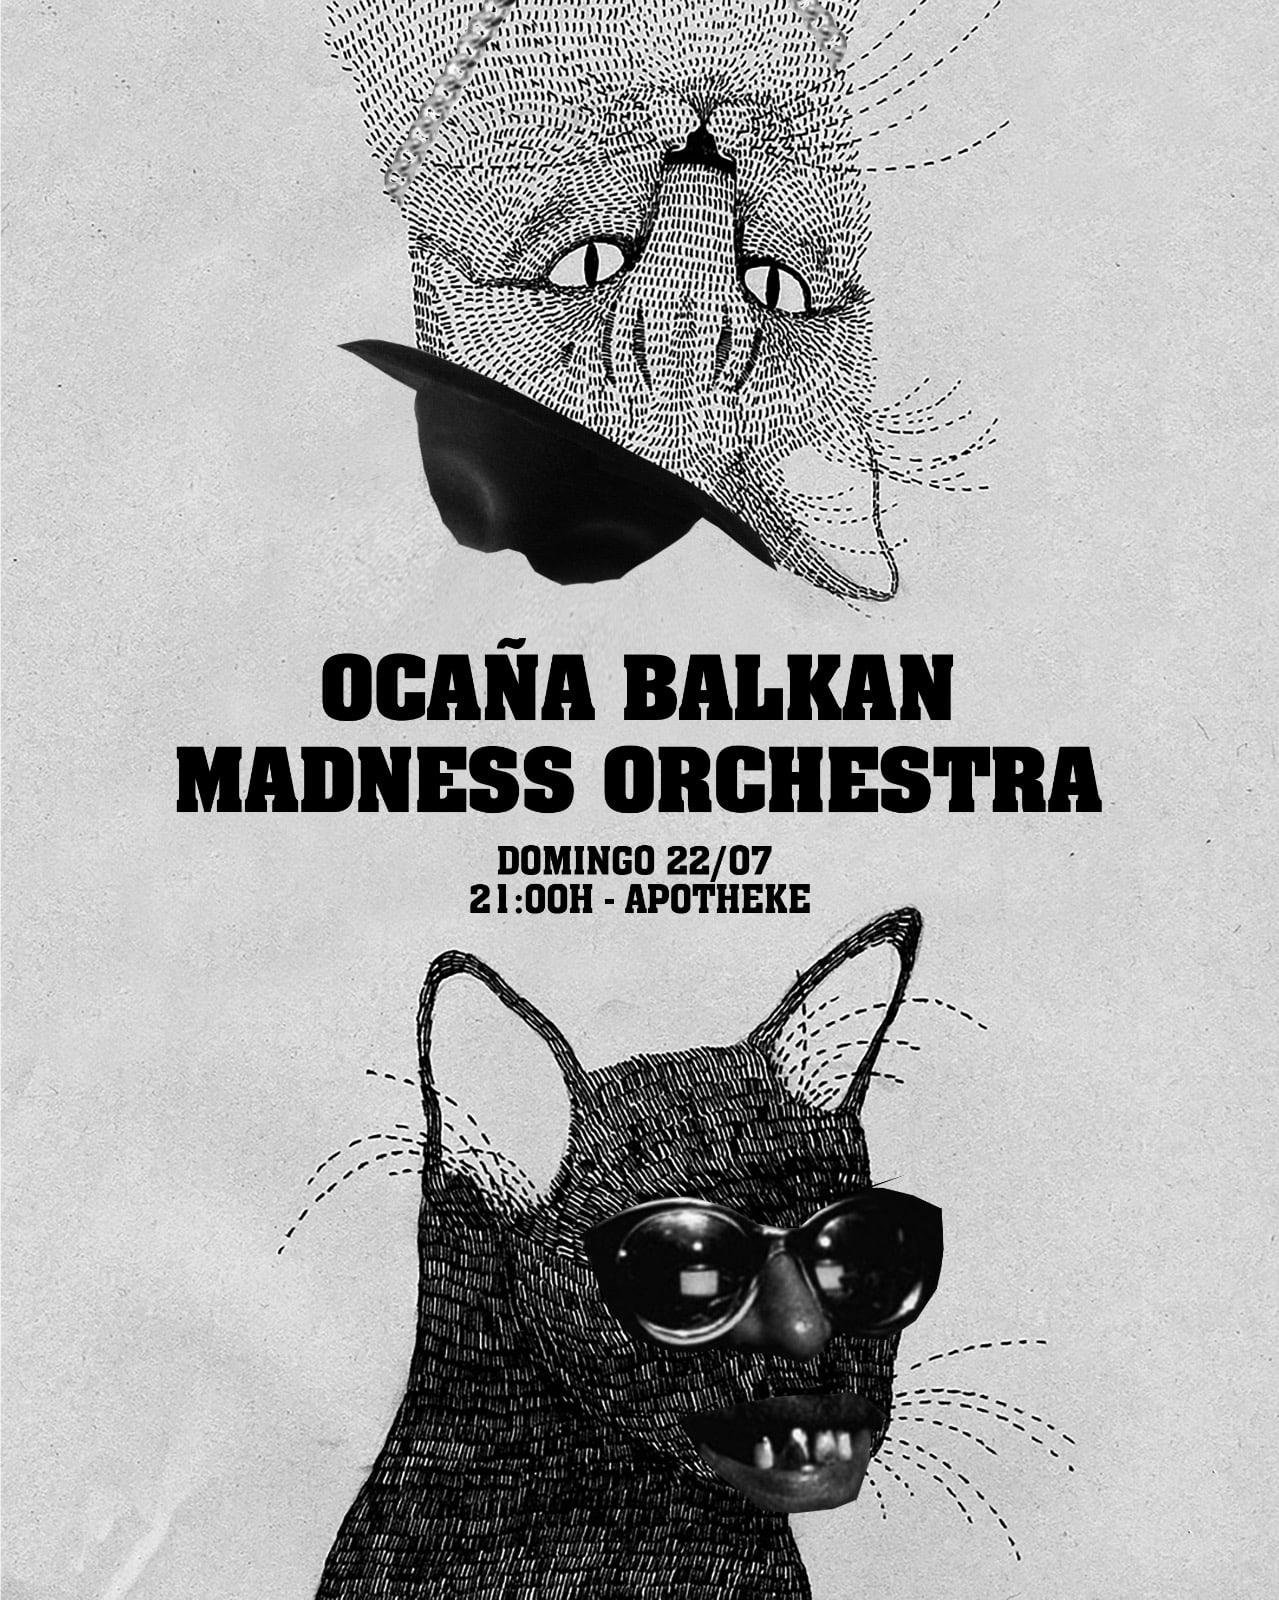 Próximo sábado con la Balkan Madness Orchestra